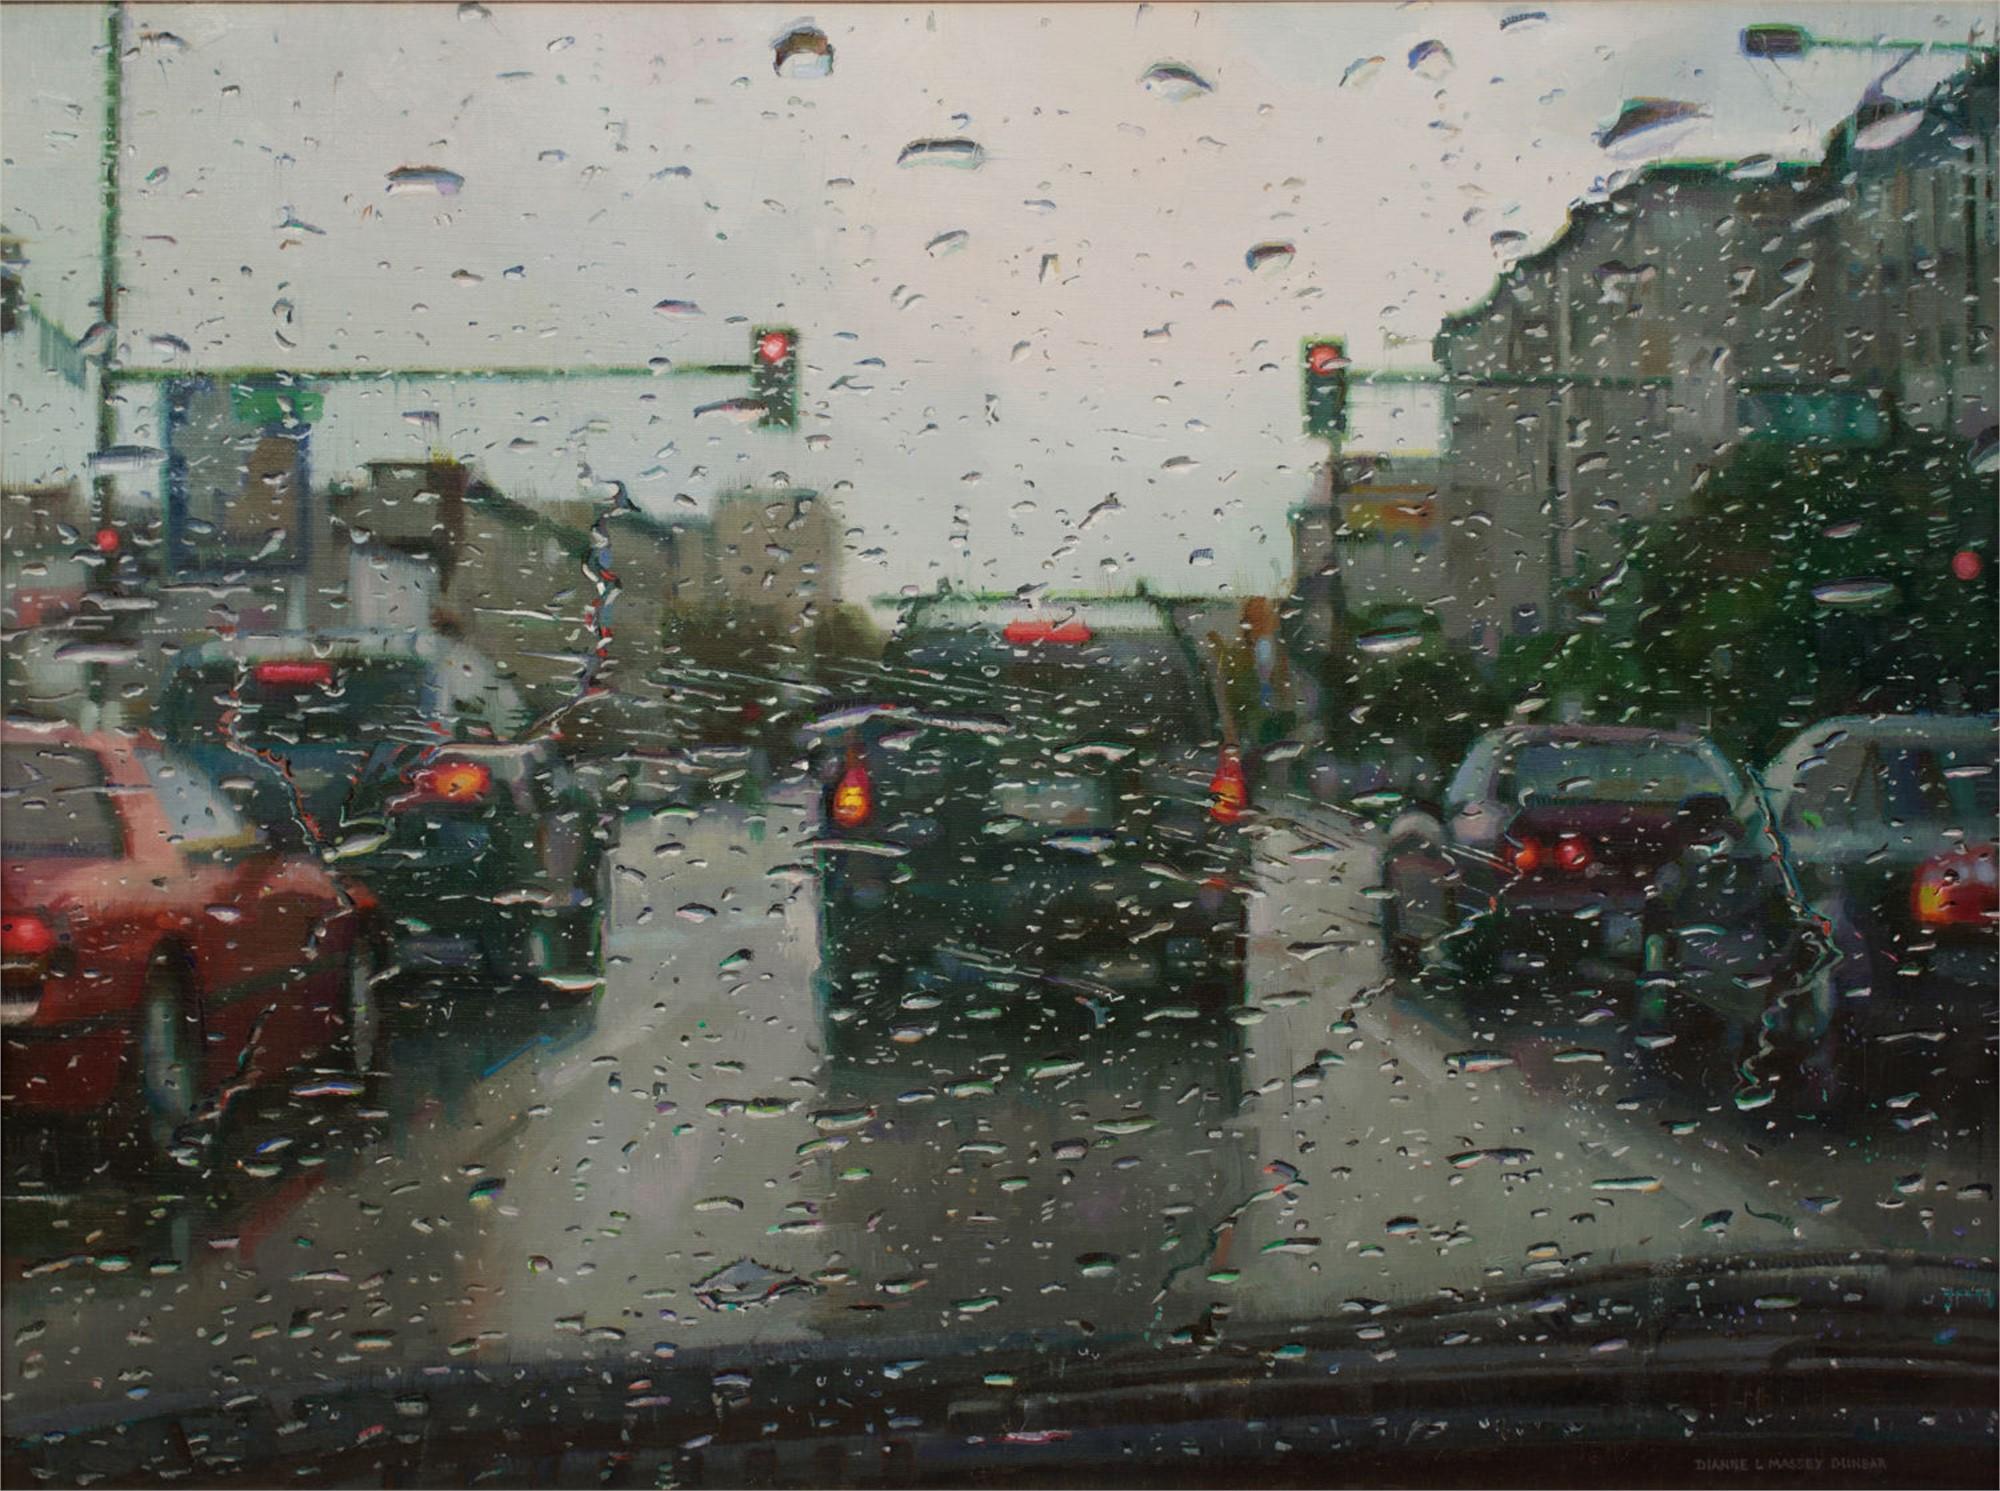 Rain on Windshield by Dianne L Massey Dunbar